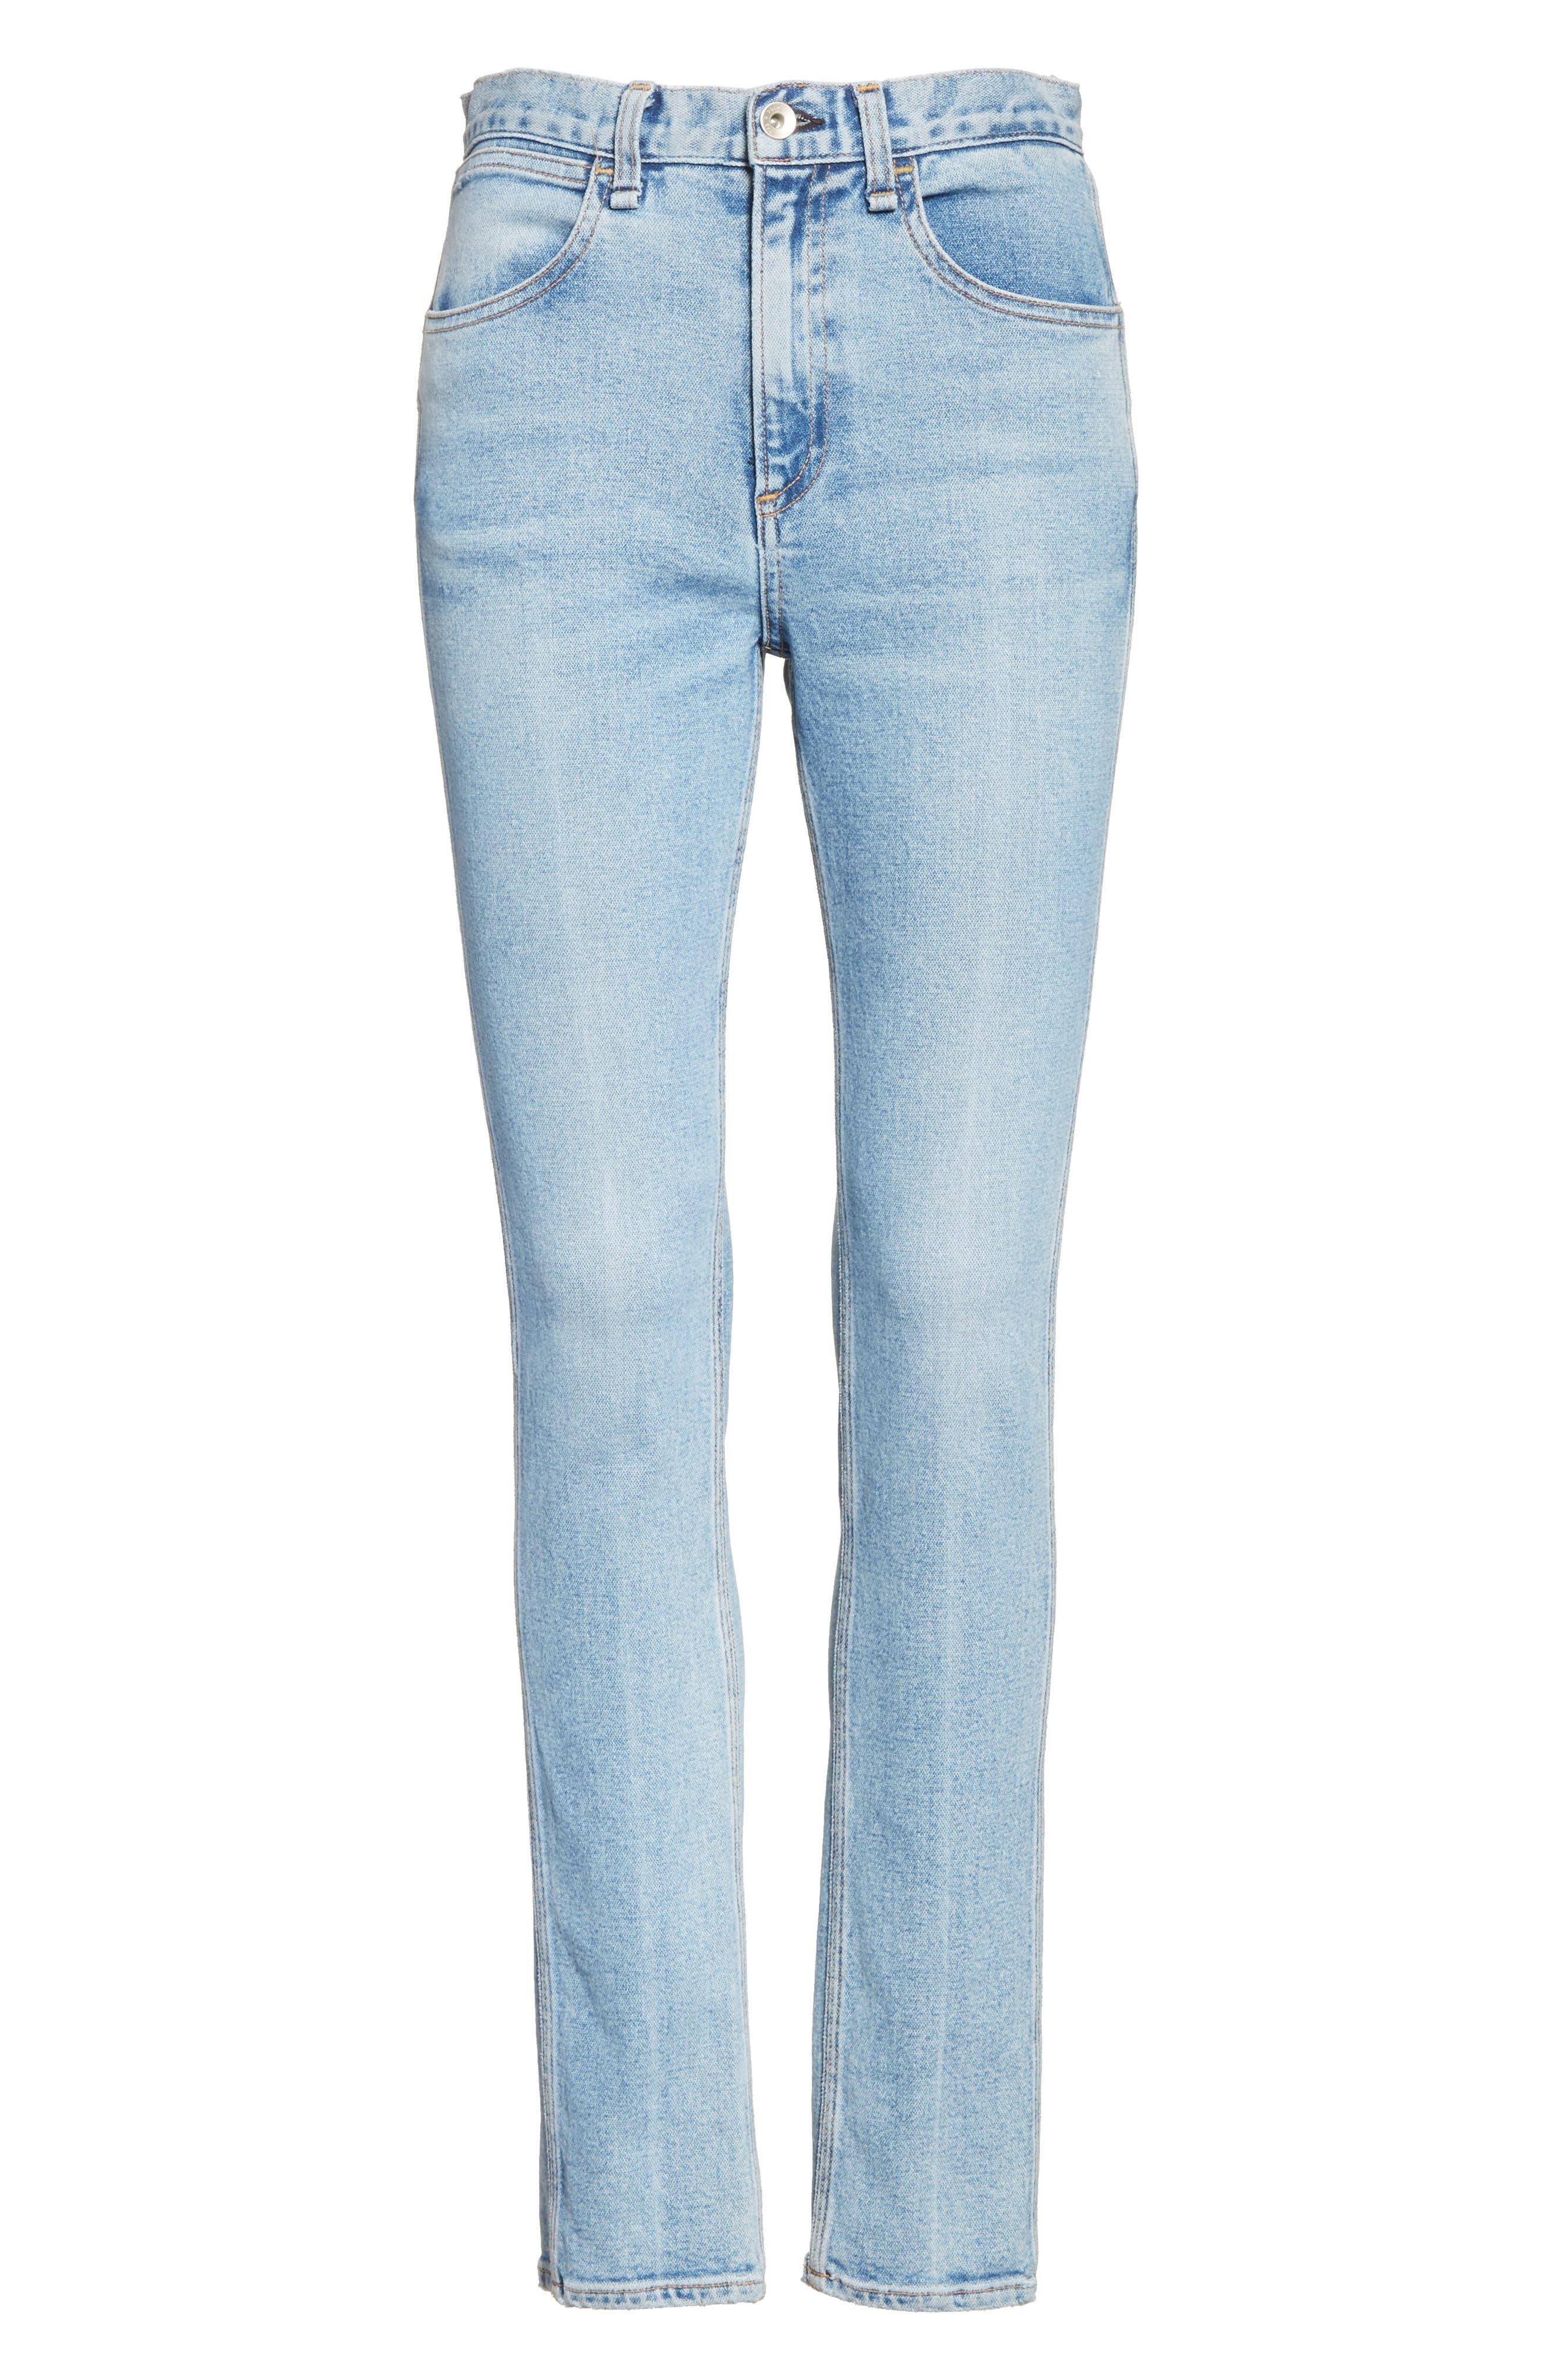 Lou High Waist Skinny Jeans,                             Alternate thumbnail 6, color,                             425